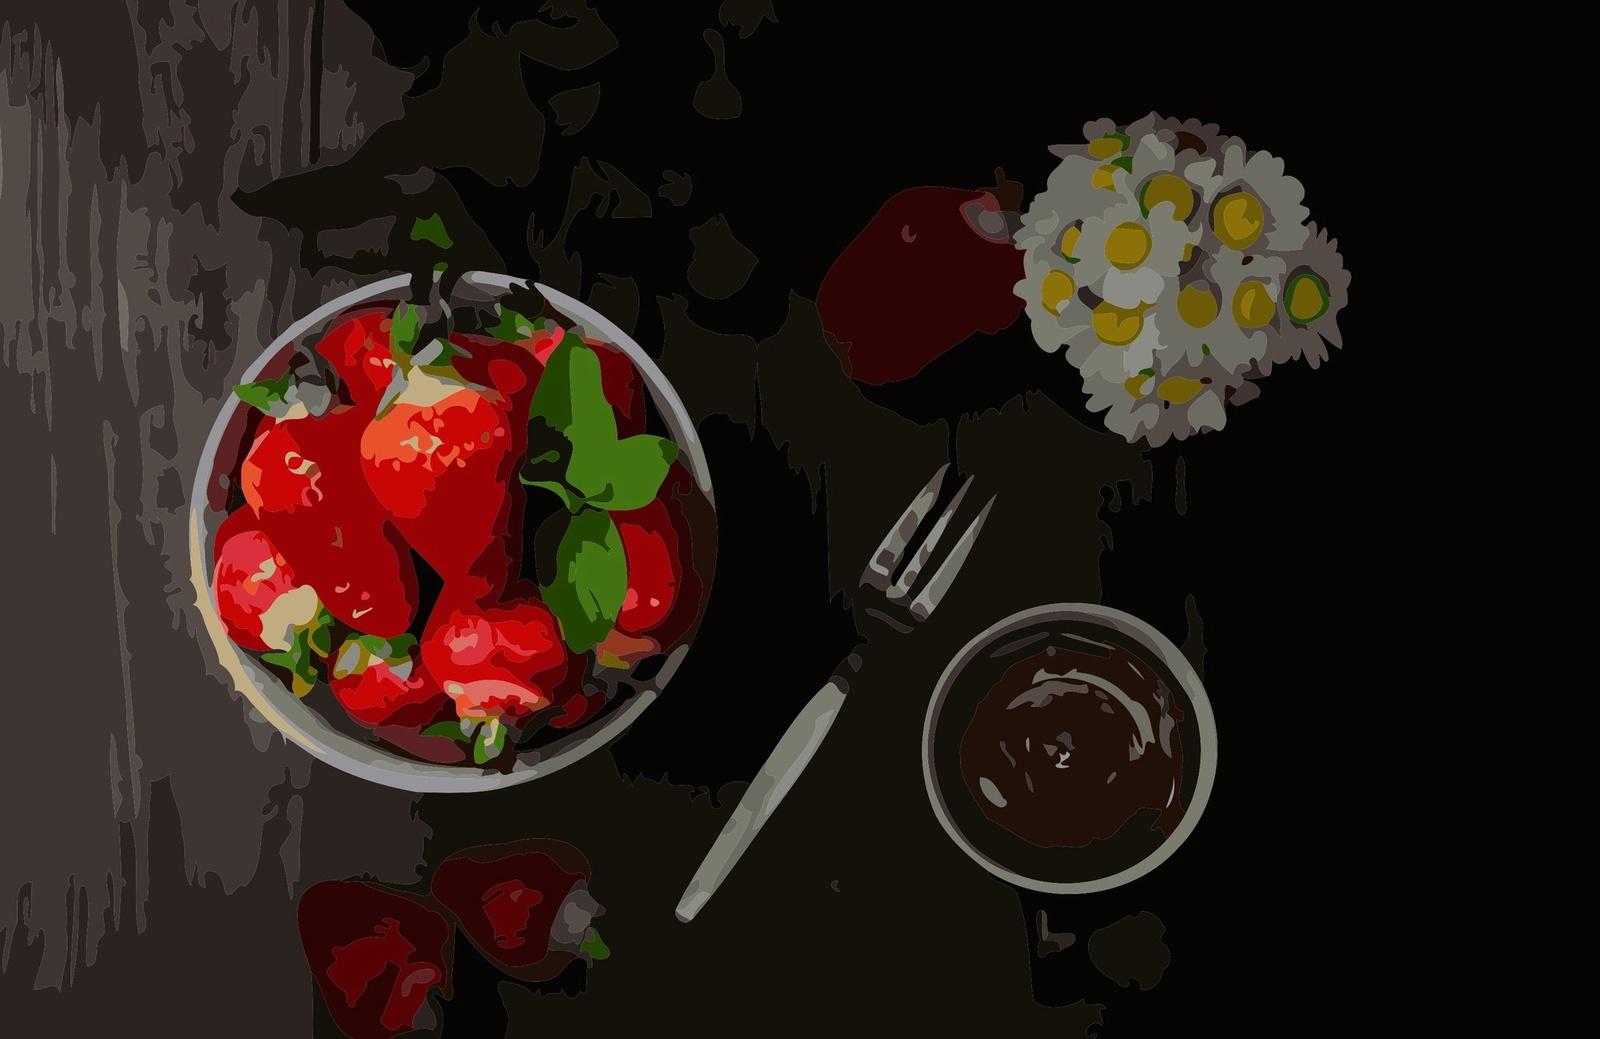 Картина по номерам ВанГогВоМне Клубника в шоколаде